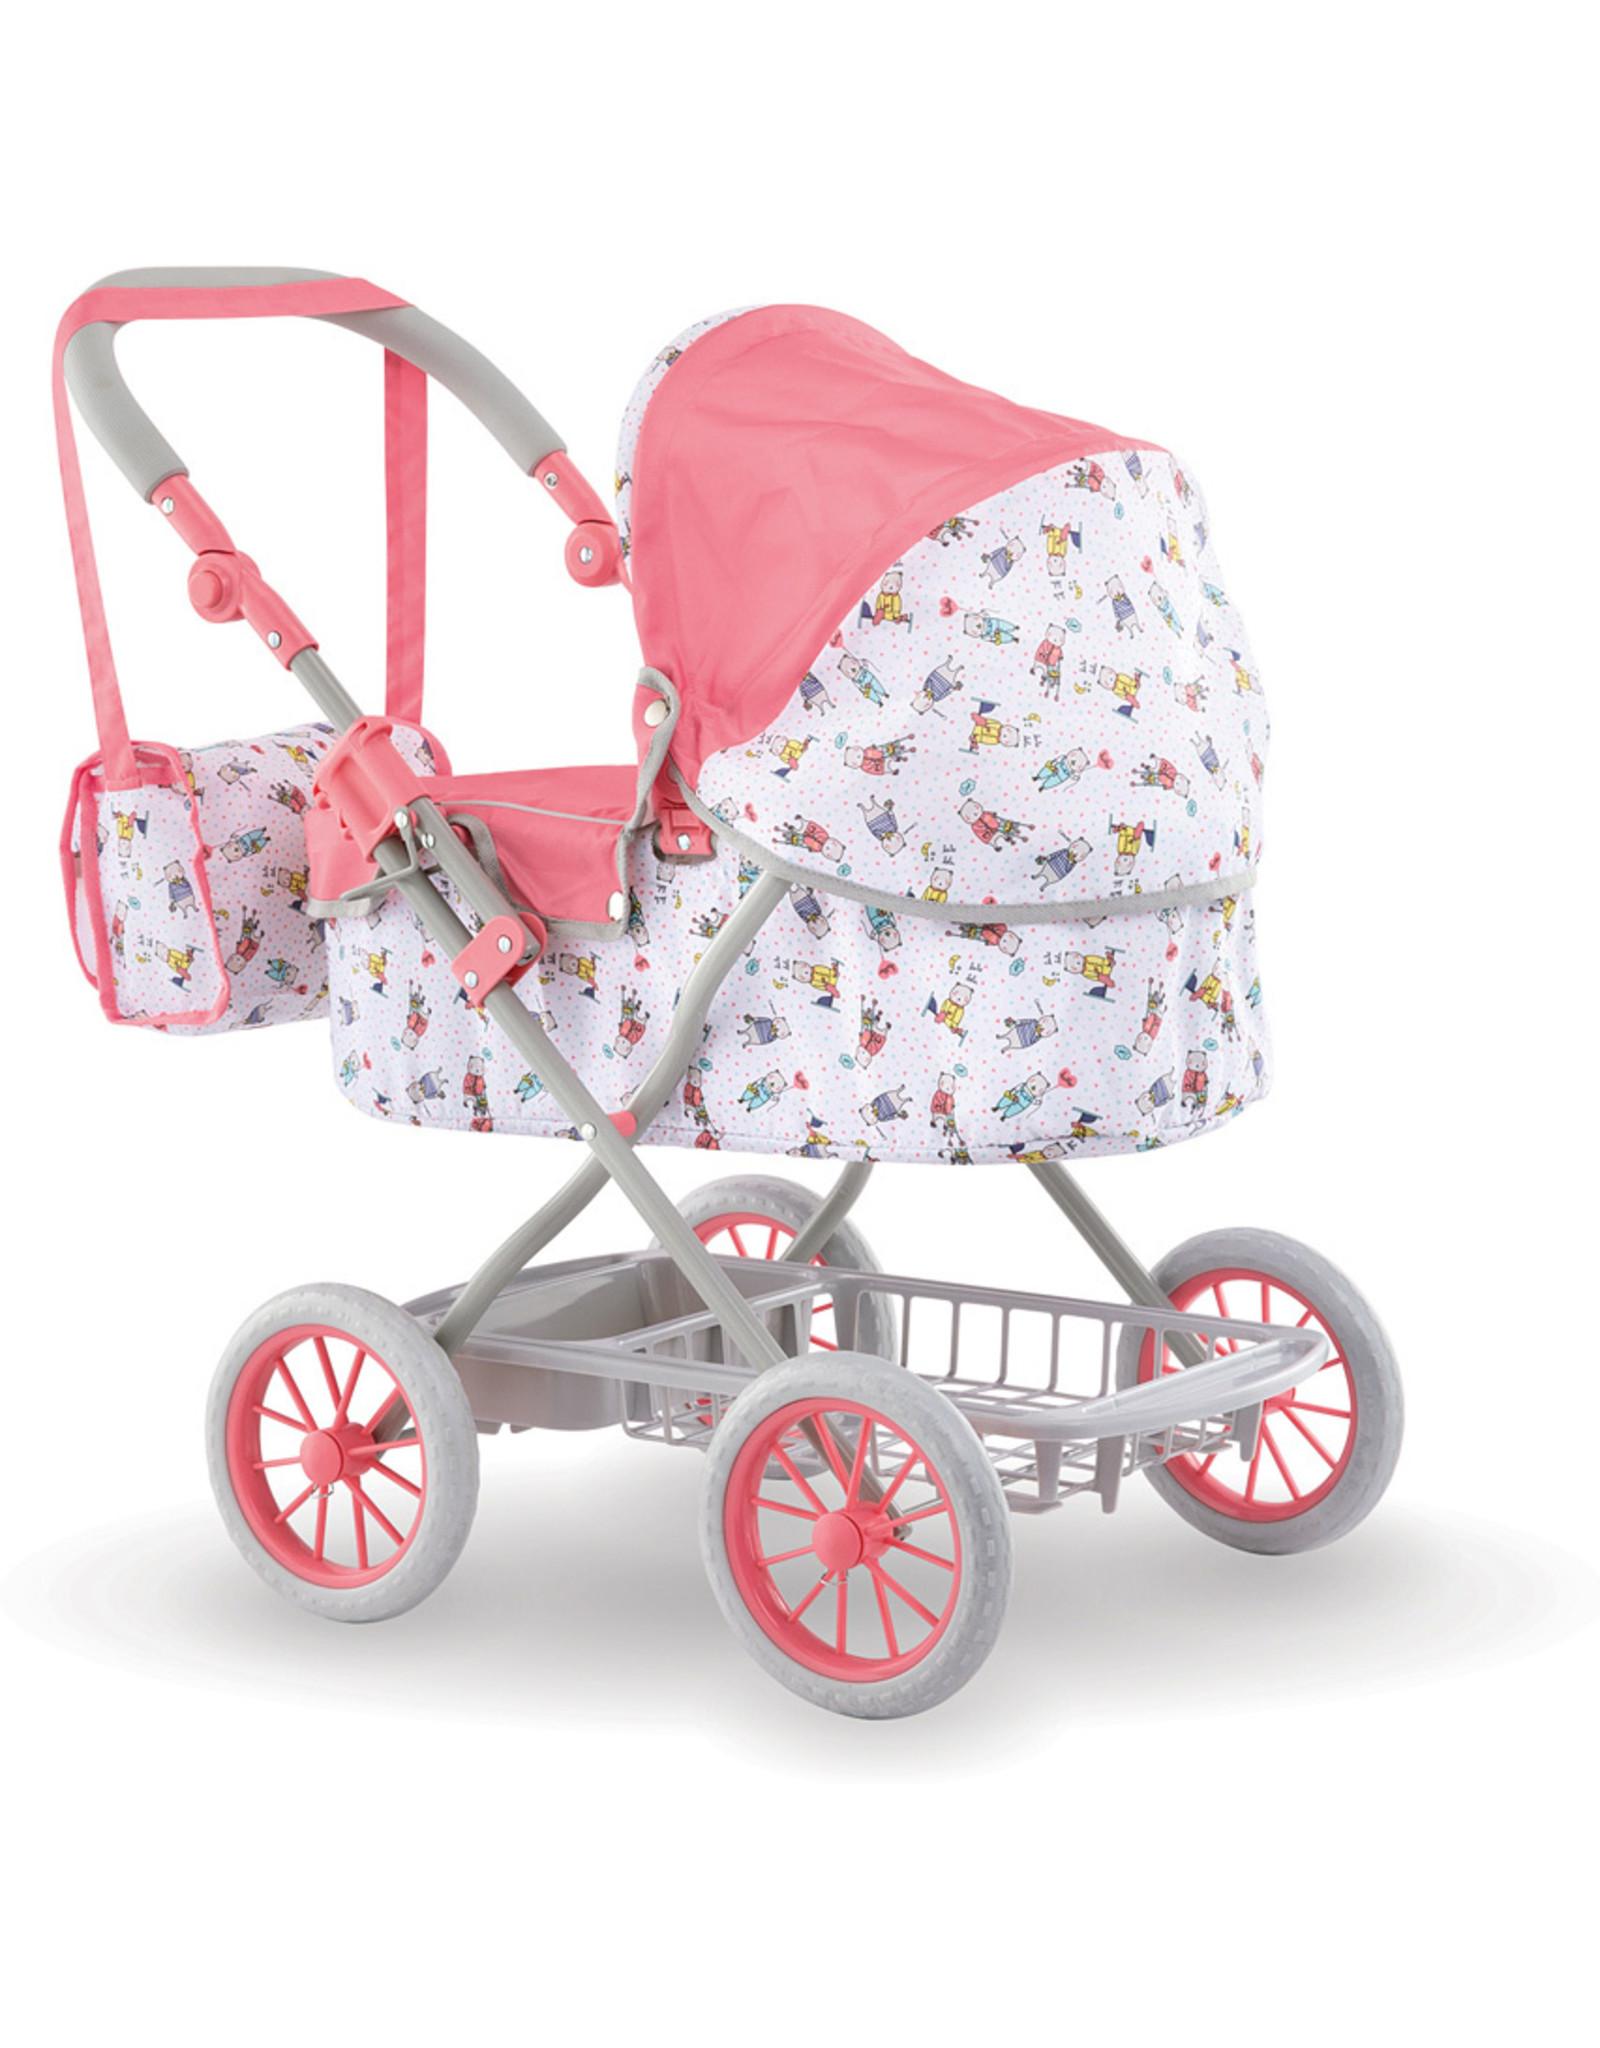 Corolle BeBe Doll Carriage and Nursery Bag